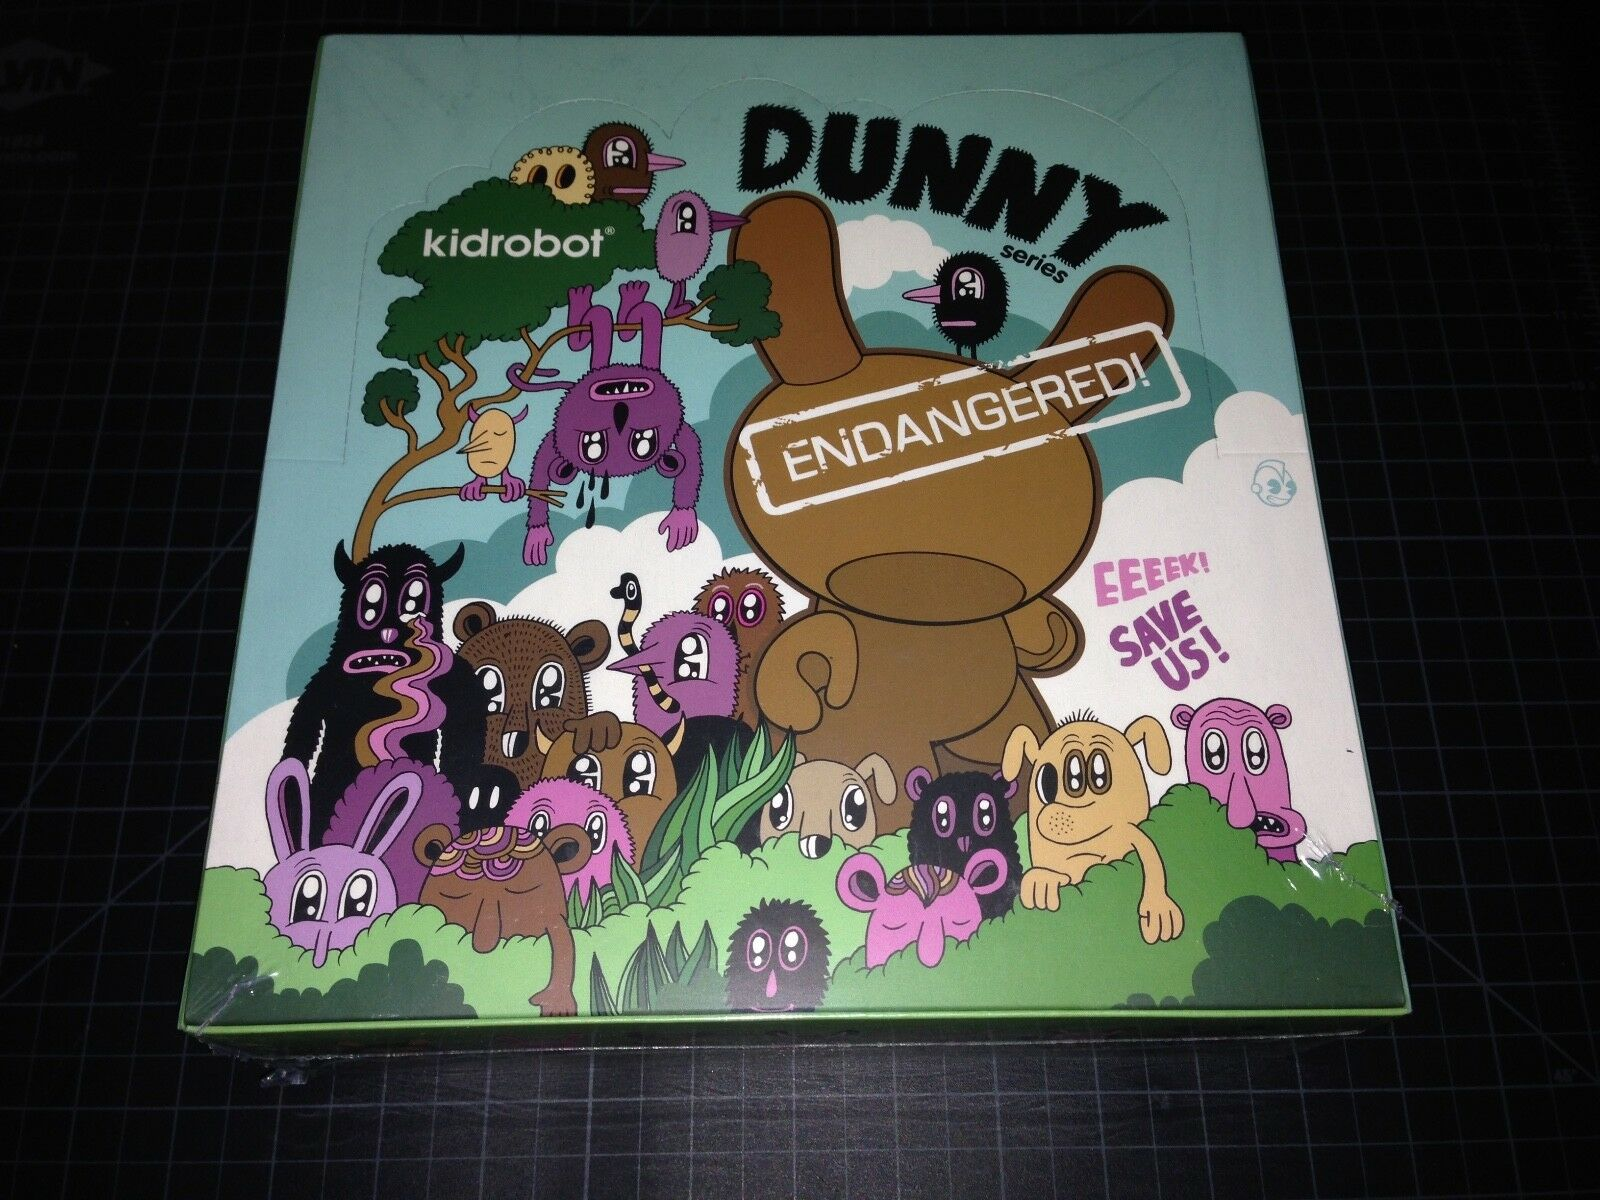 Kidrobot x DUNNY EndangeROT FACTORY SEALED Case Blind Boxes Vinyl Figure Toy